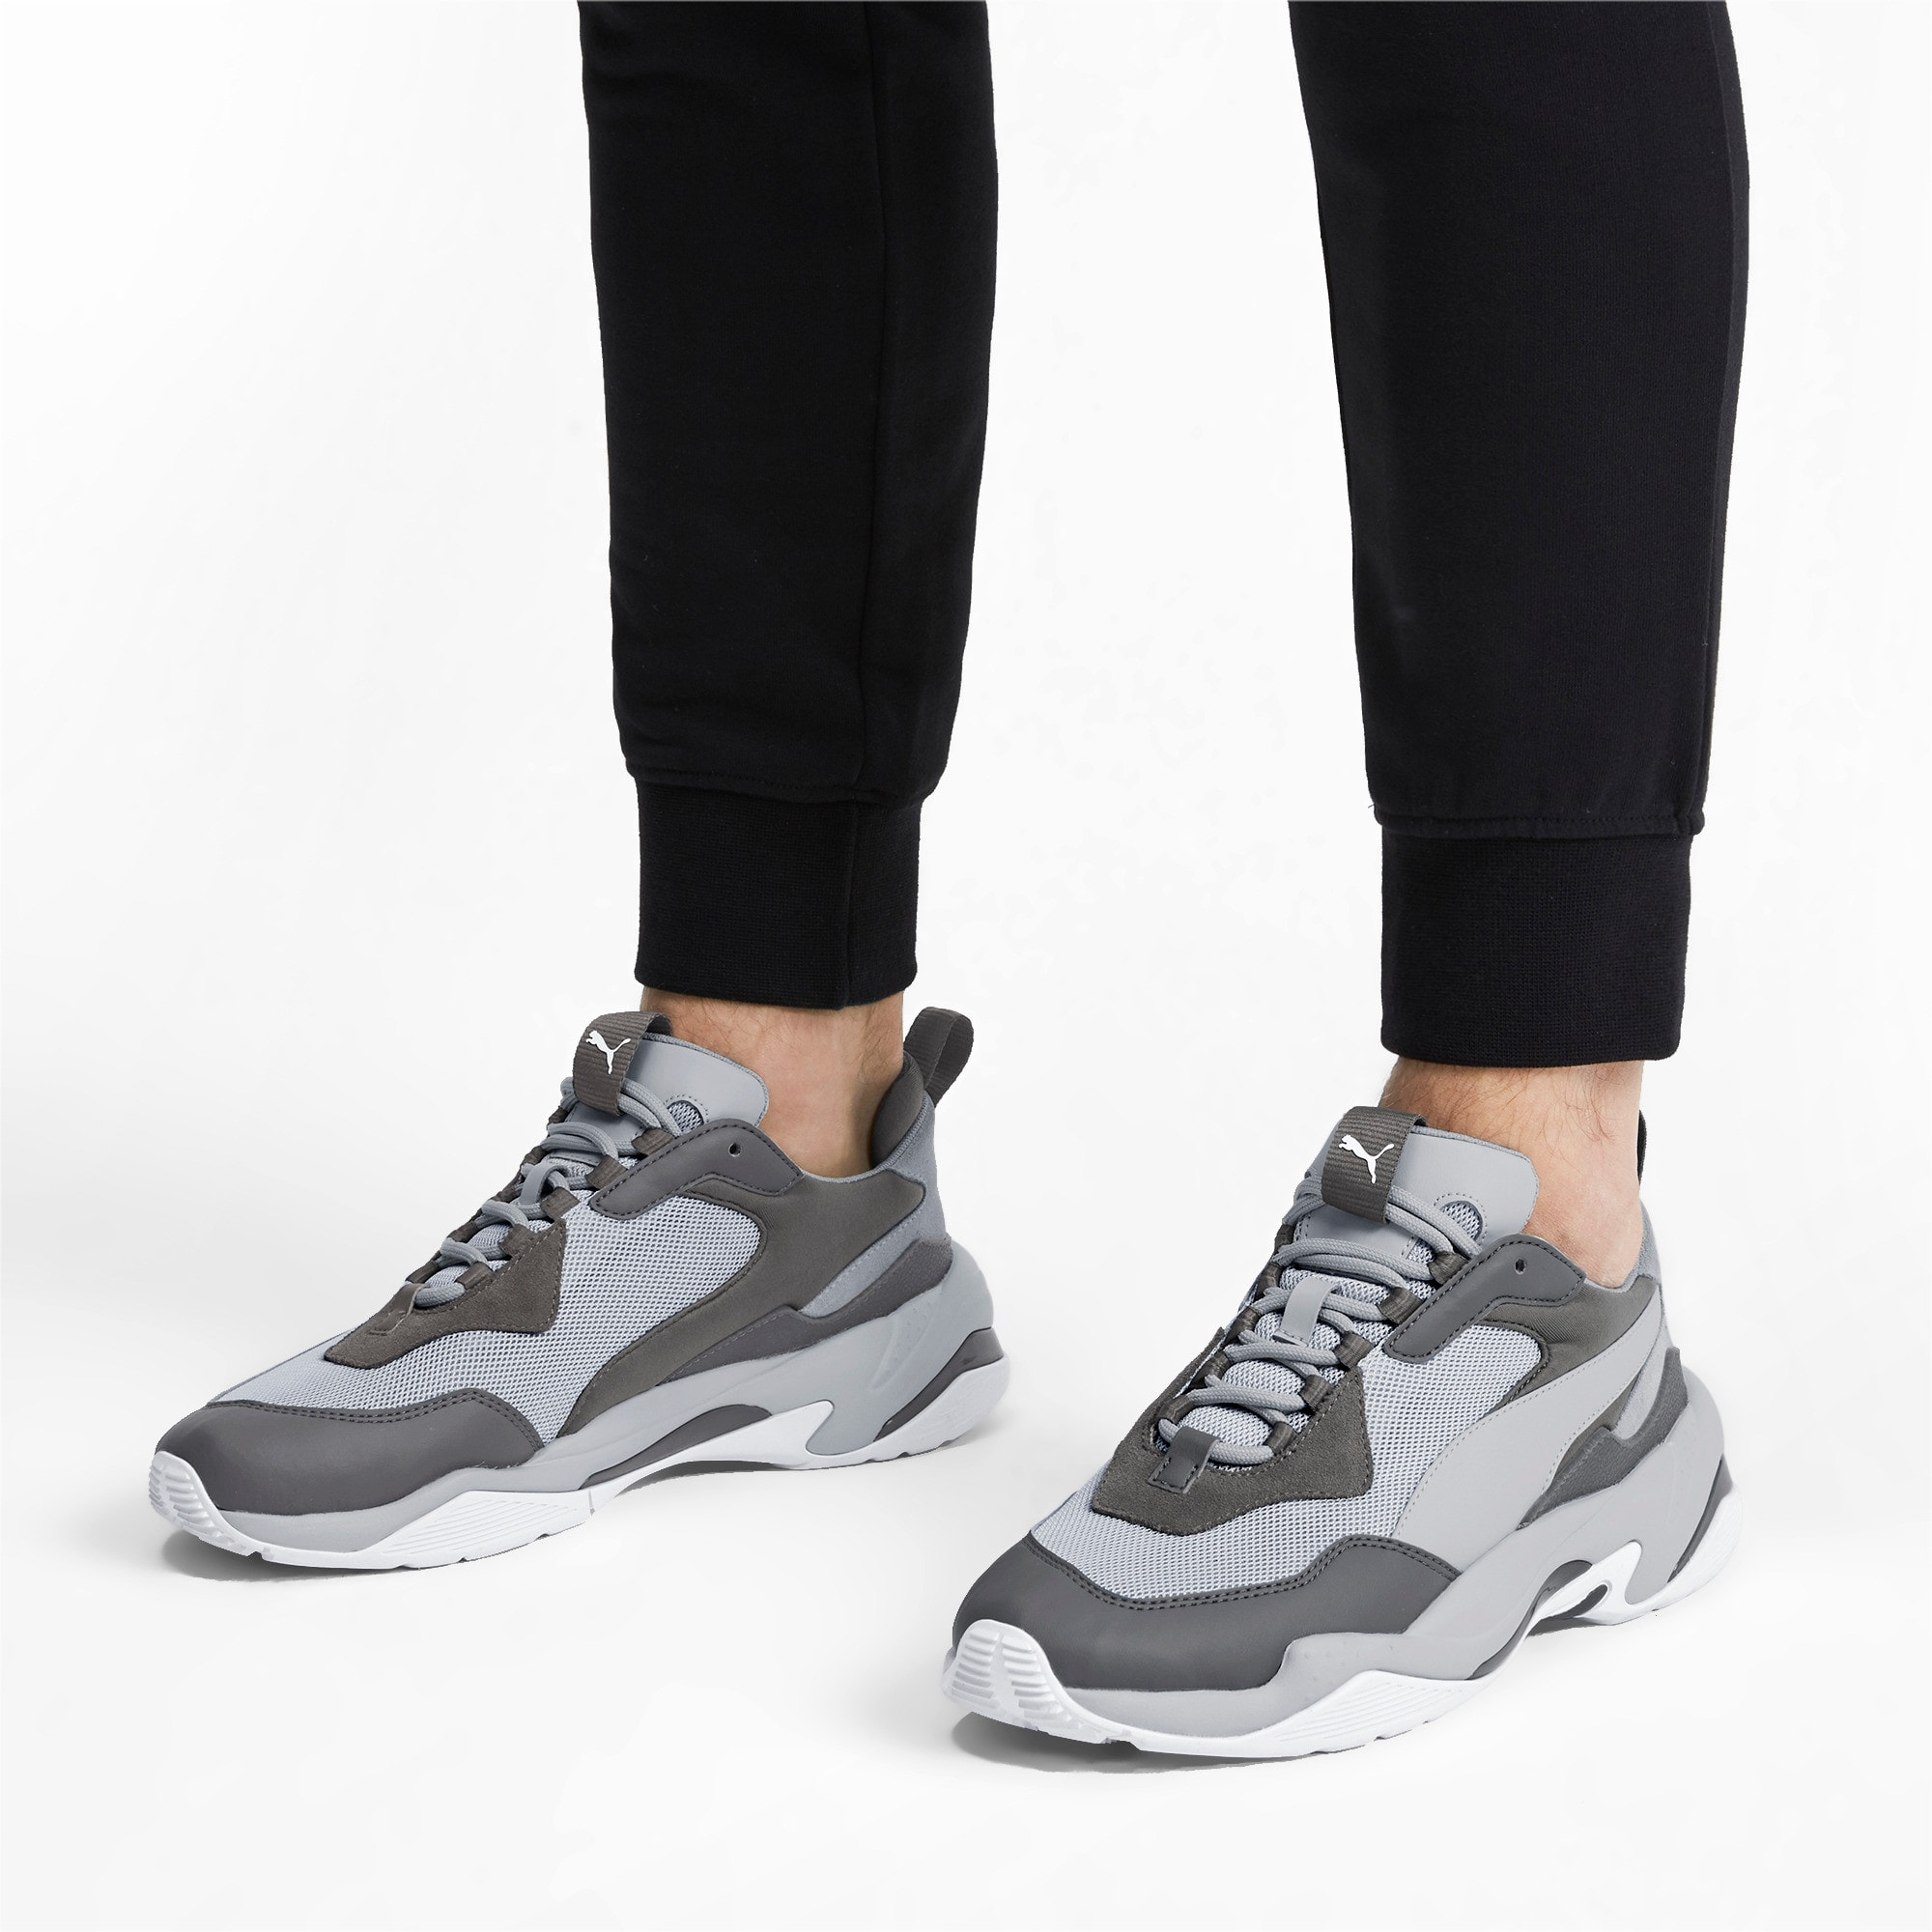 Thumbnail 2 of Thunder Fashion 2.0 Sneakers, High Rise-CASTLEROCK, medium